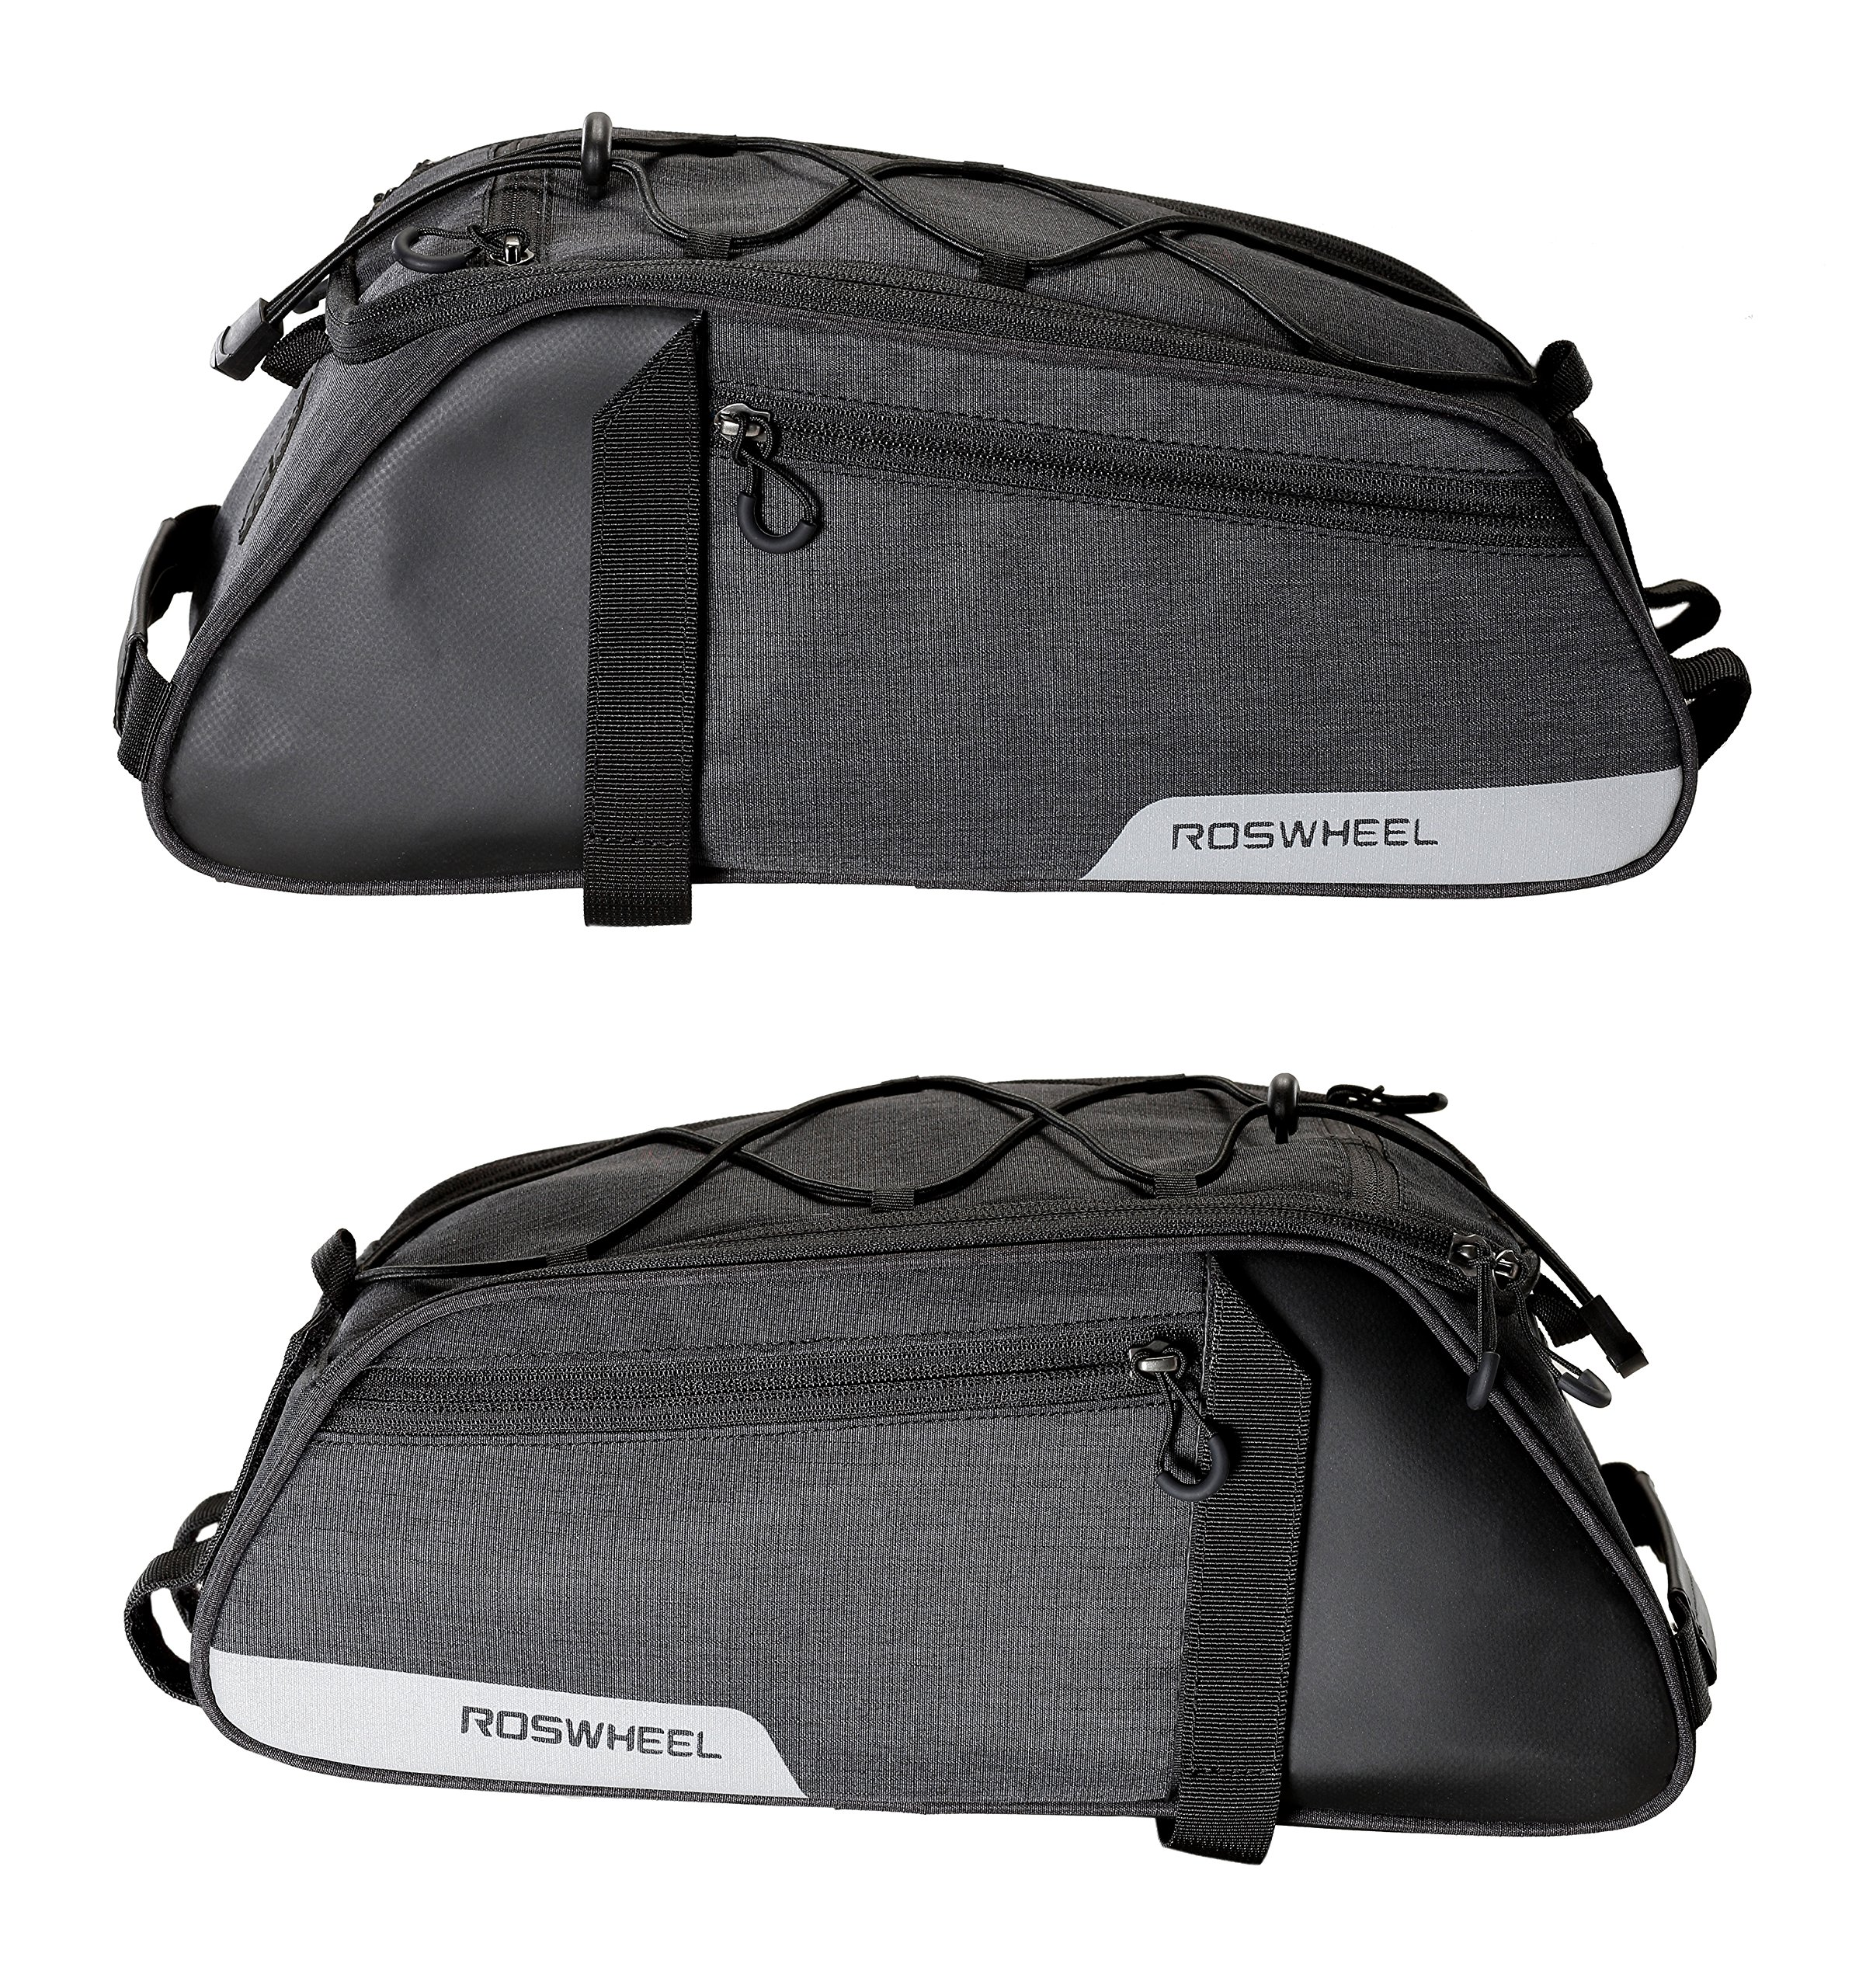 Roswheel Essentials Series 141466 Bike Trunk Bag Bicycle Rear Rack Pack Cycling Accessories Pannier, 8L Capacity by Roswheel (Image #3)